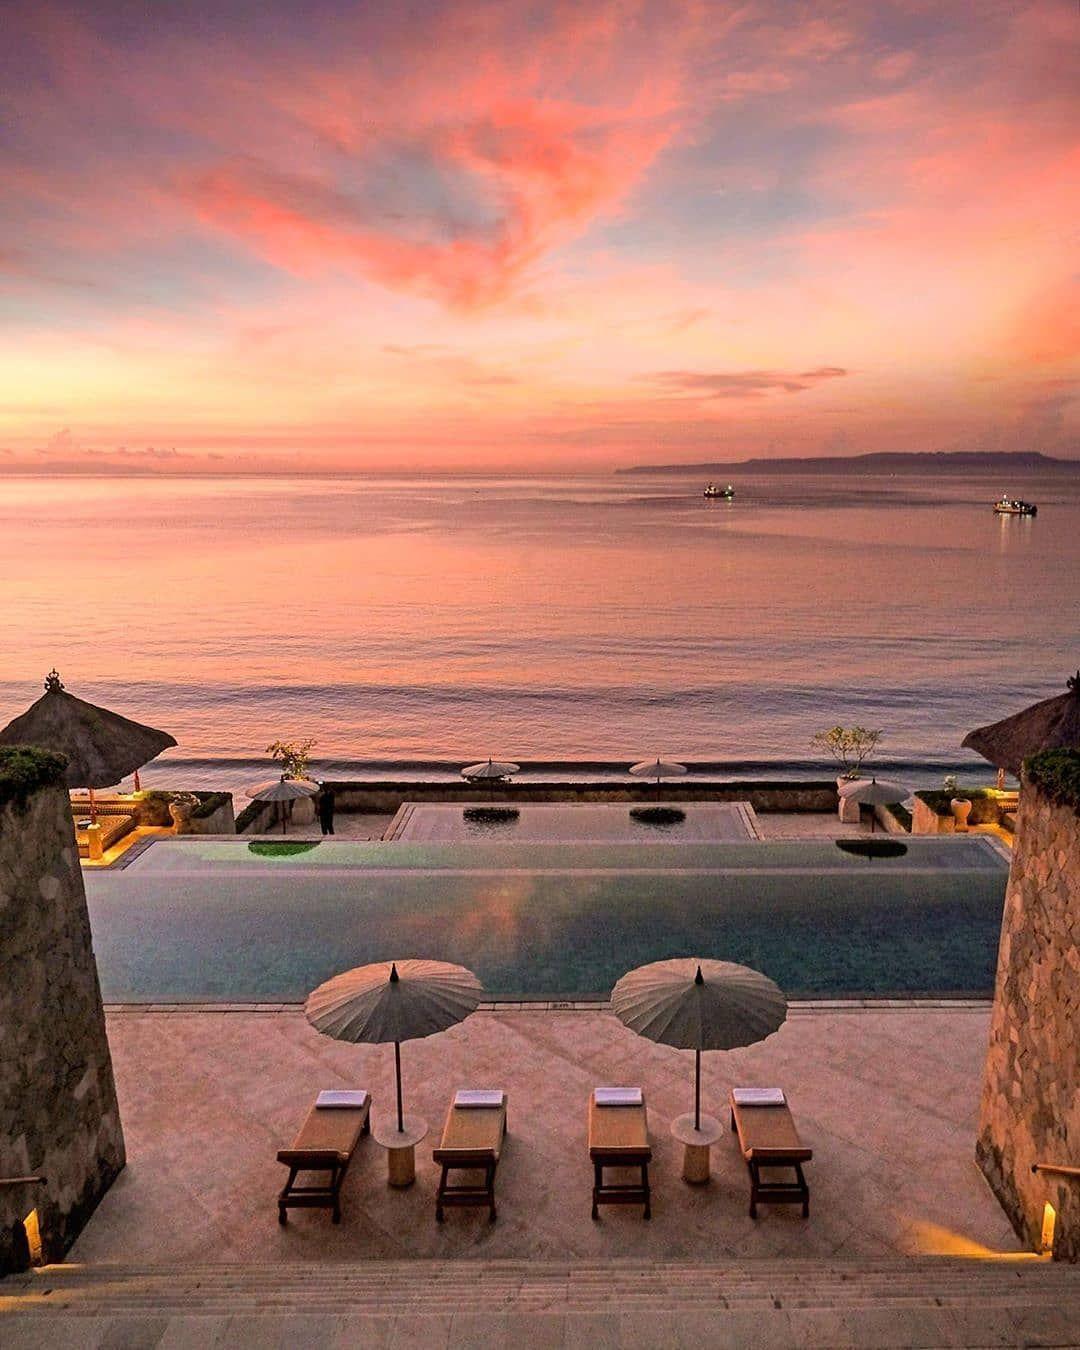 ٍsave it #dailyviraltopics #hotels #hotel #travel #vacation #hospitality #luxury #hotellife #holiday #restaurant #hotelroom #luxuryhotel #luxuryhotels #restaurants #beach #interiordesign #hotelier #resort #resorts